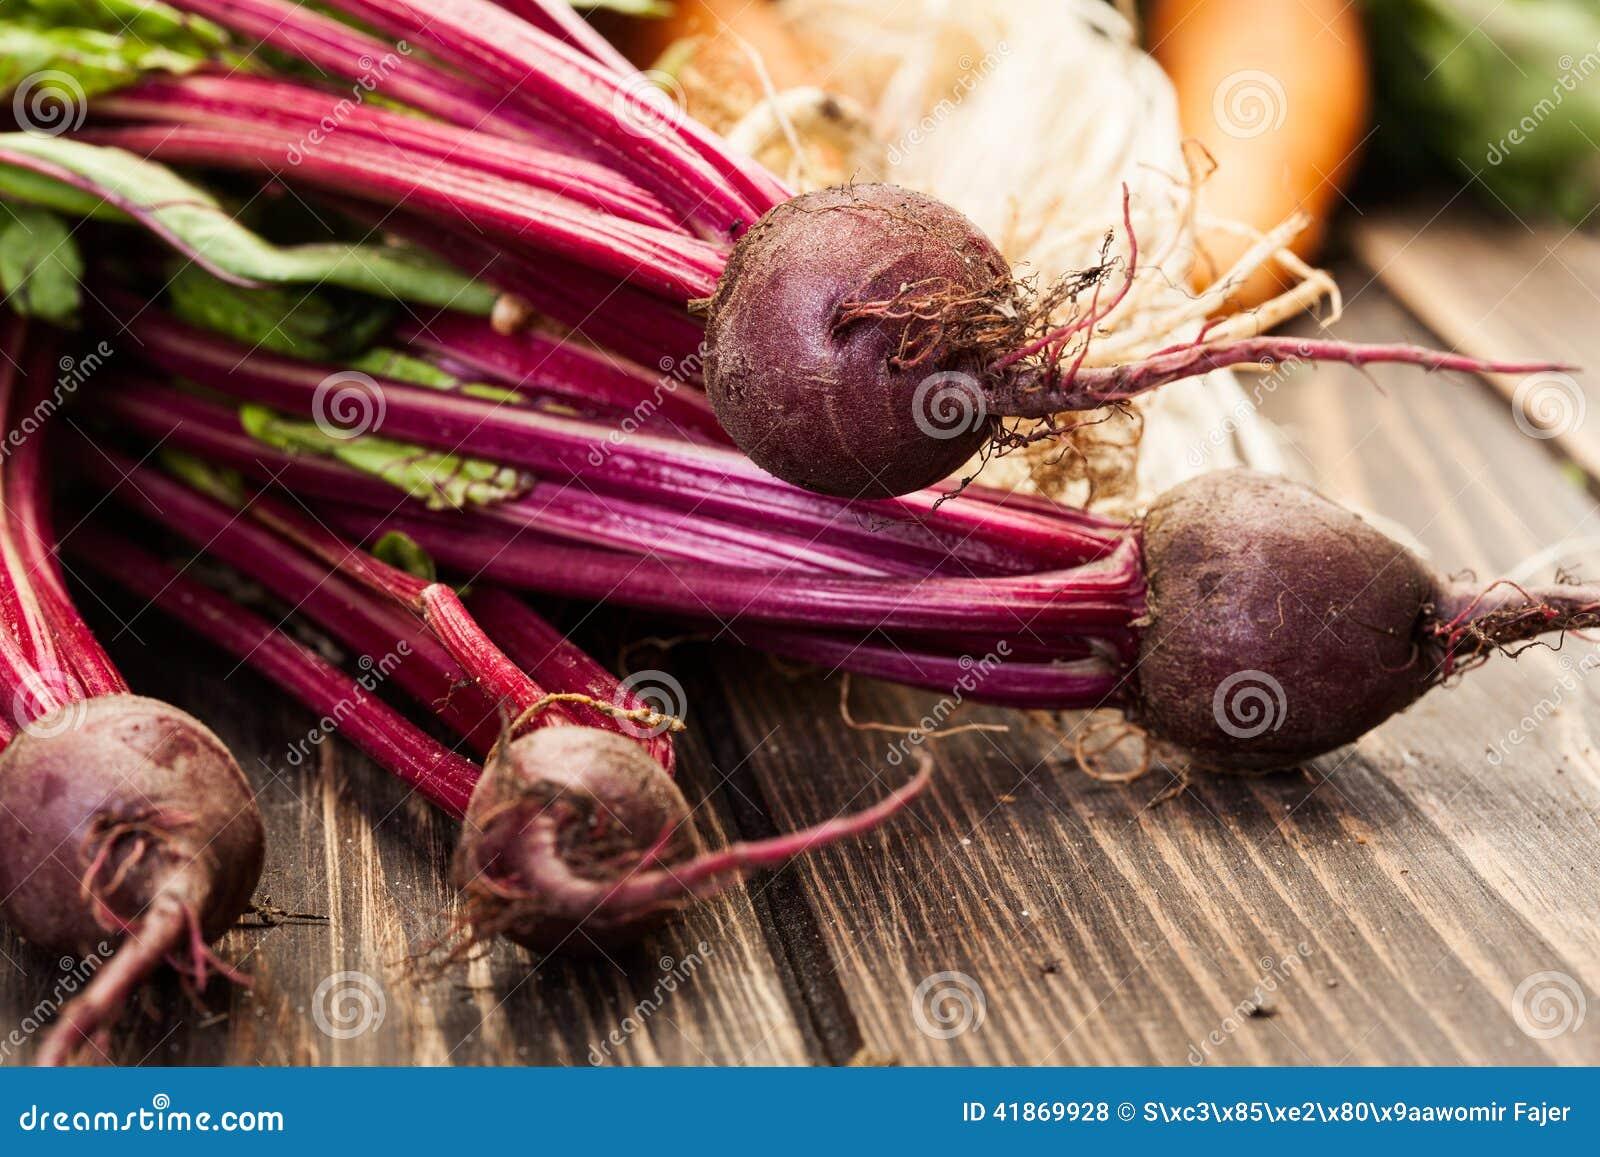 Beetroots, carrots and leek